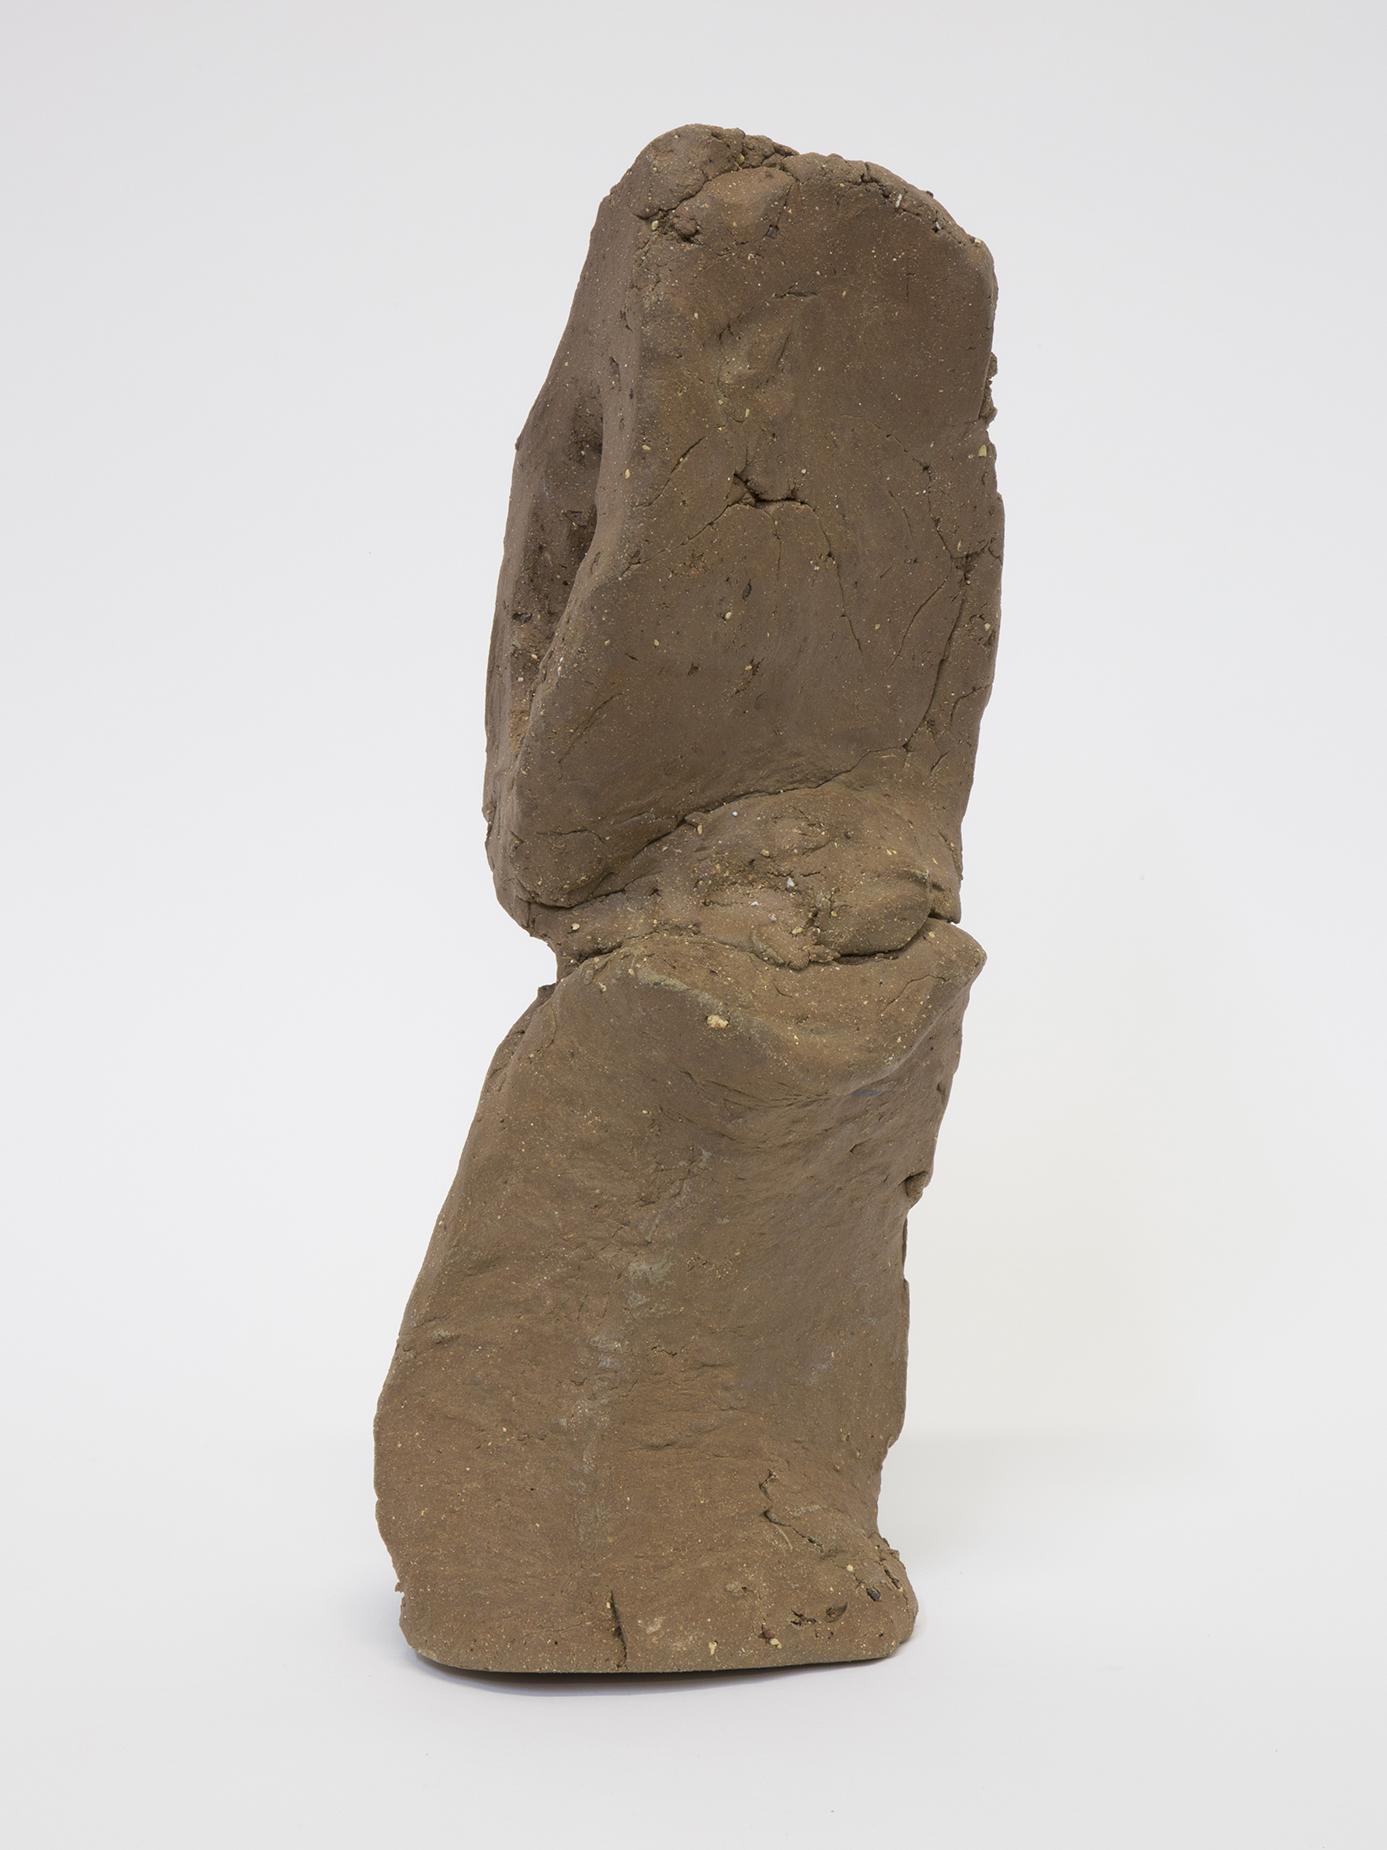 Sebastian Gladstone   Untitled Fired Stoneware , 2019 fired stoneware 15 ½ x 6 ½ x 5 in.